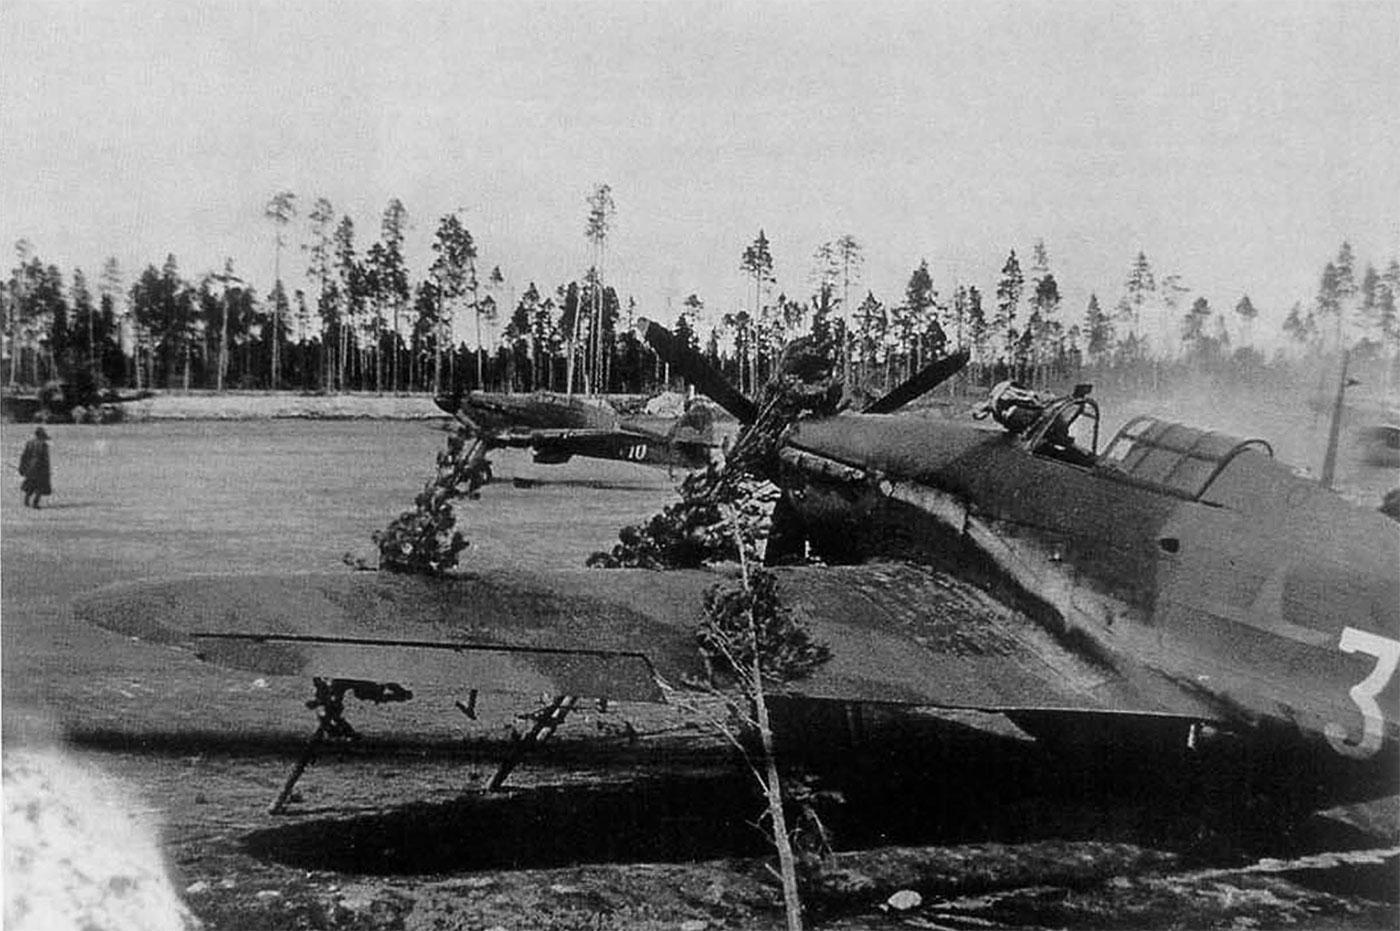 Hurricane I USSR 1GvIAP White 32 and White 10 Russia 1942 01